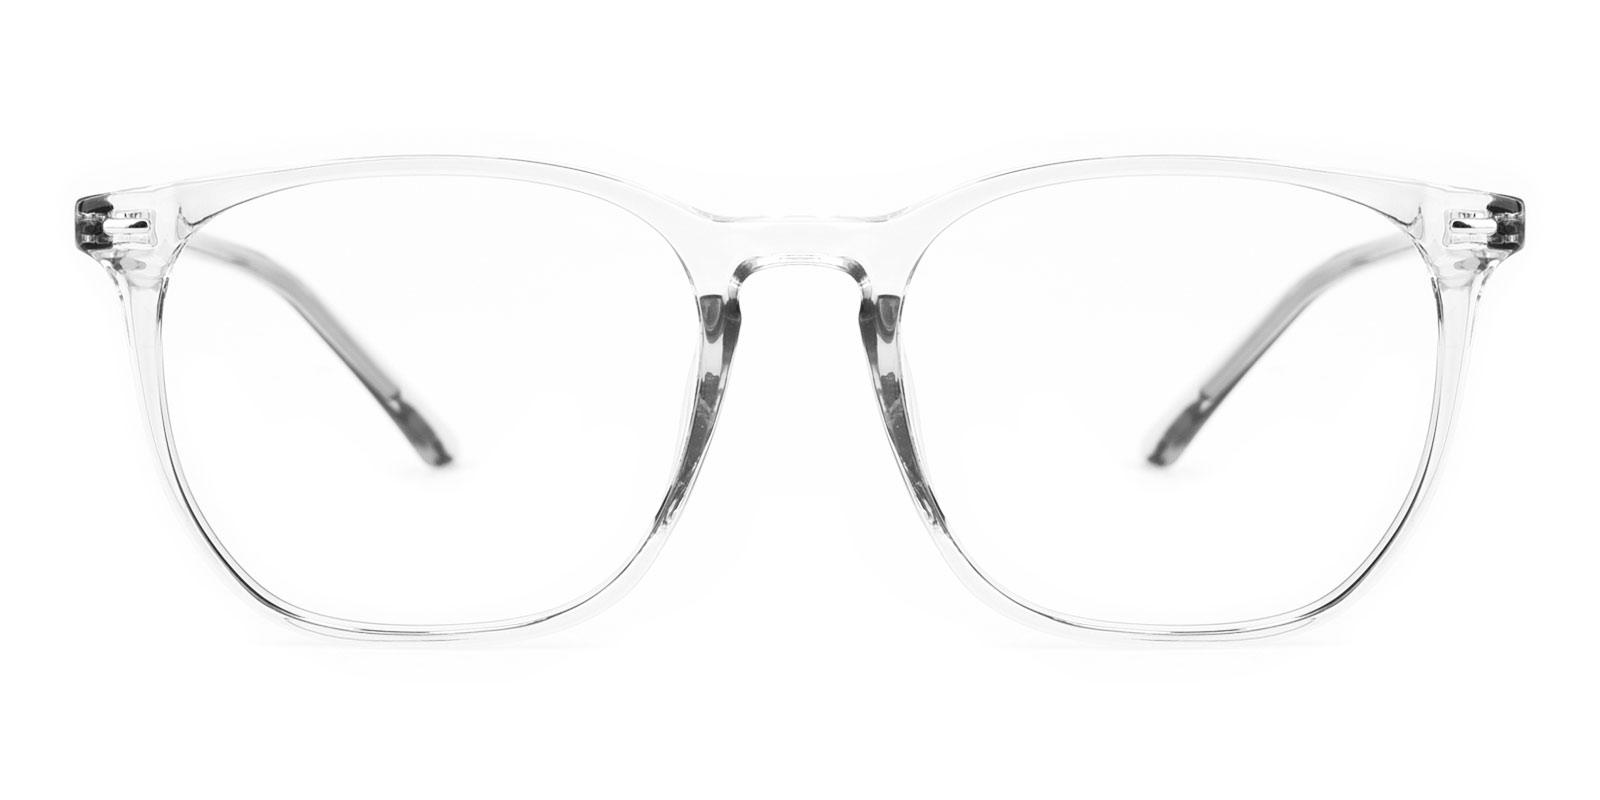 Mintcandy-Translucent-Rectangle-TR-Eyeglasses-detail